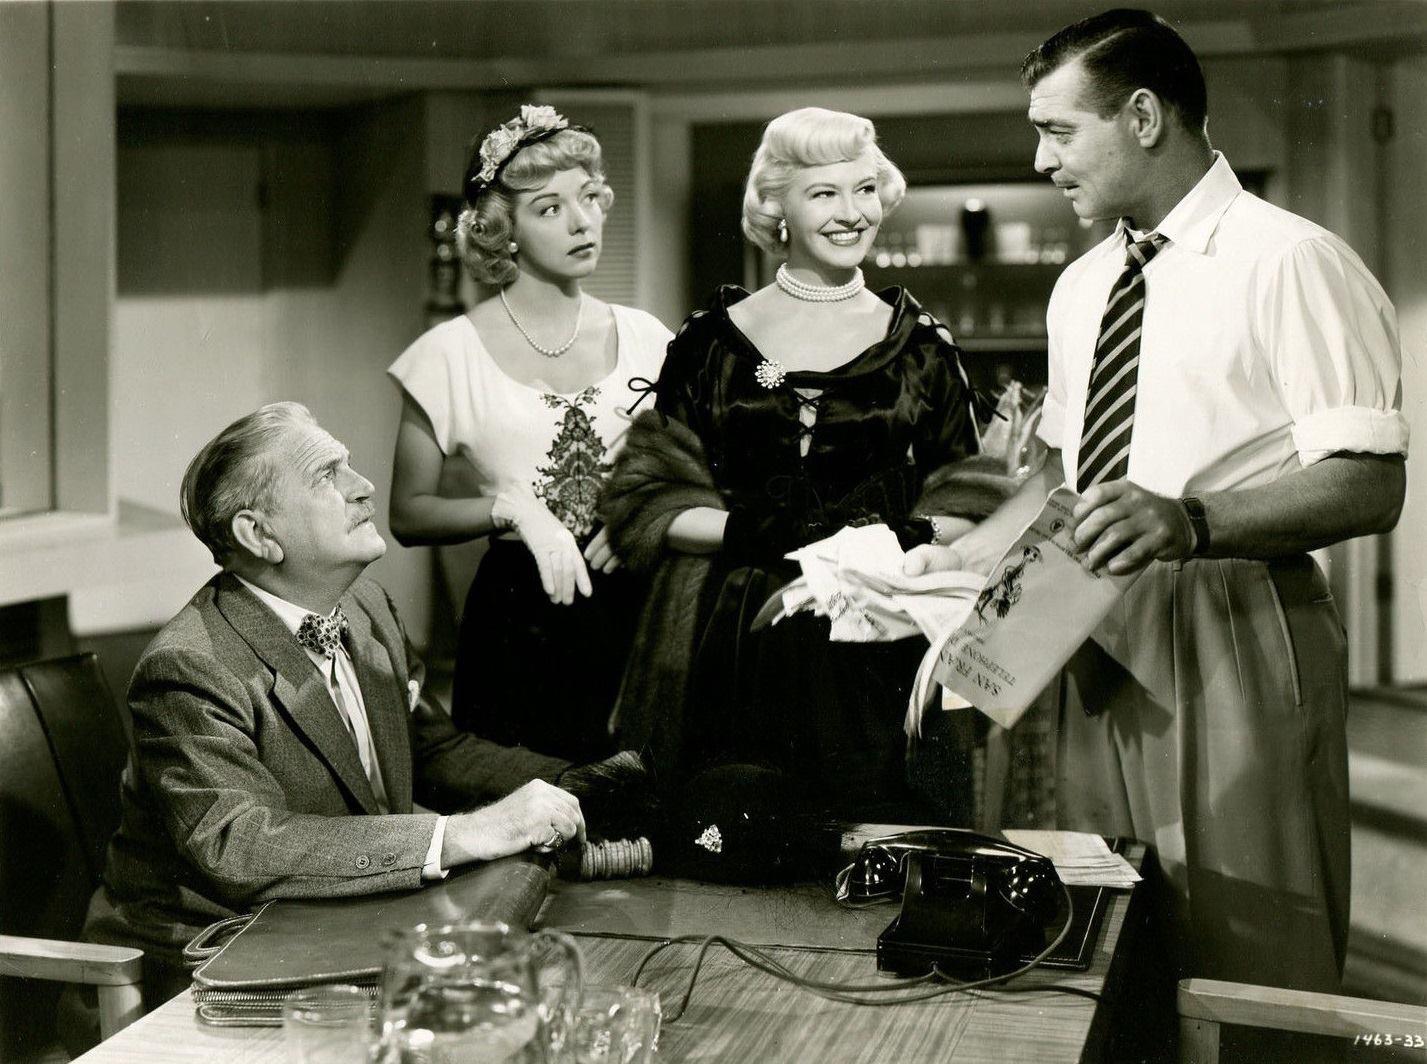 Frank Morgan, Pamela Britton, Marilyn Maxwell & Clark Gable - Key To The City, 1950